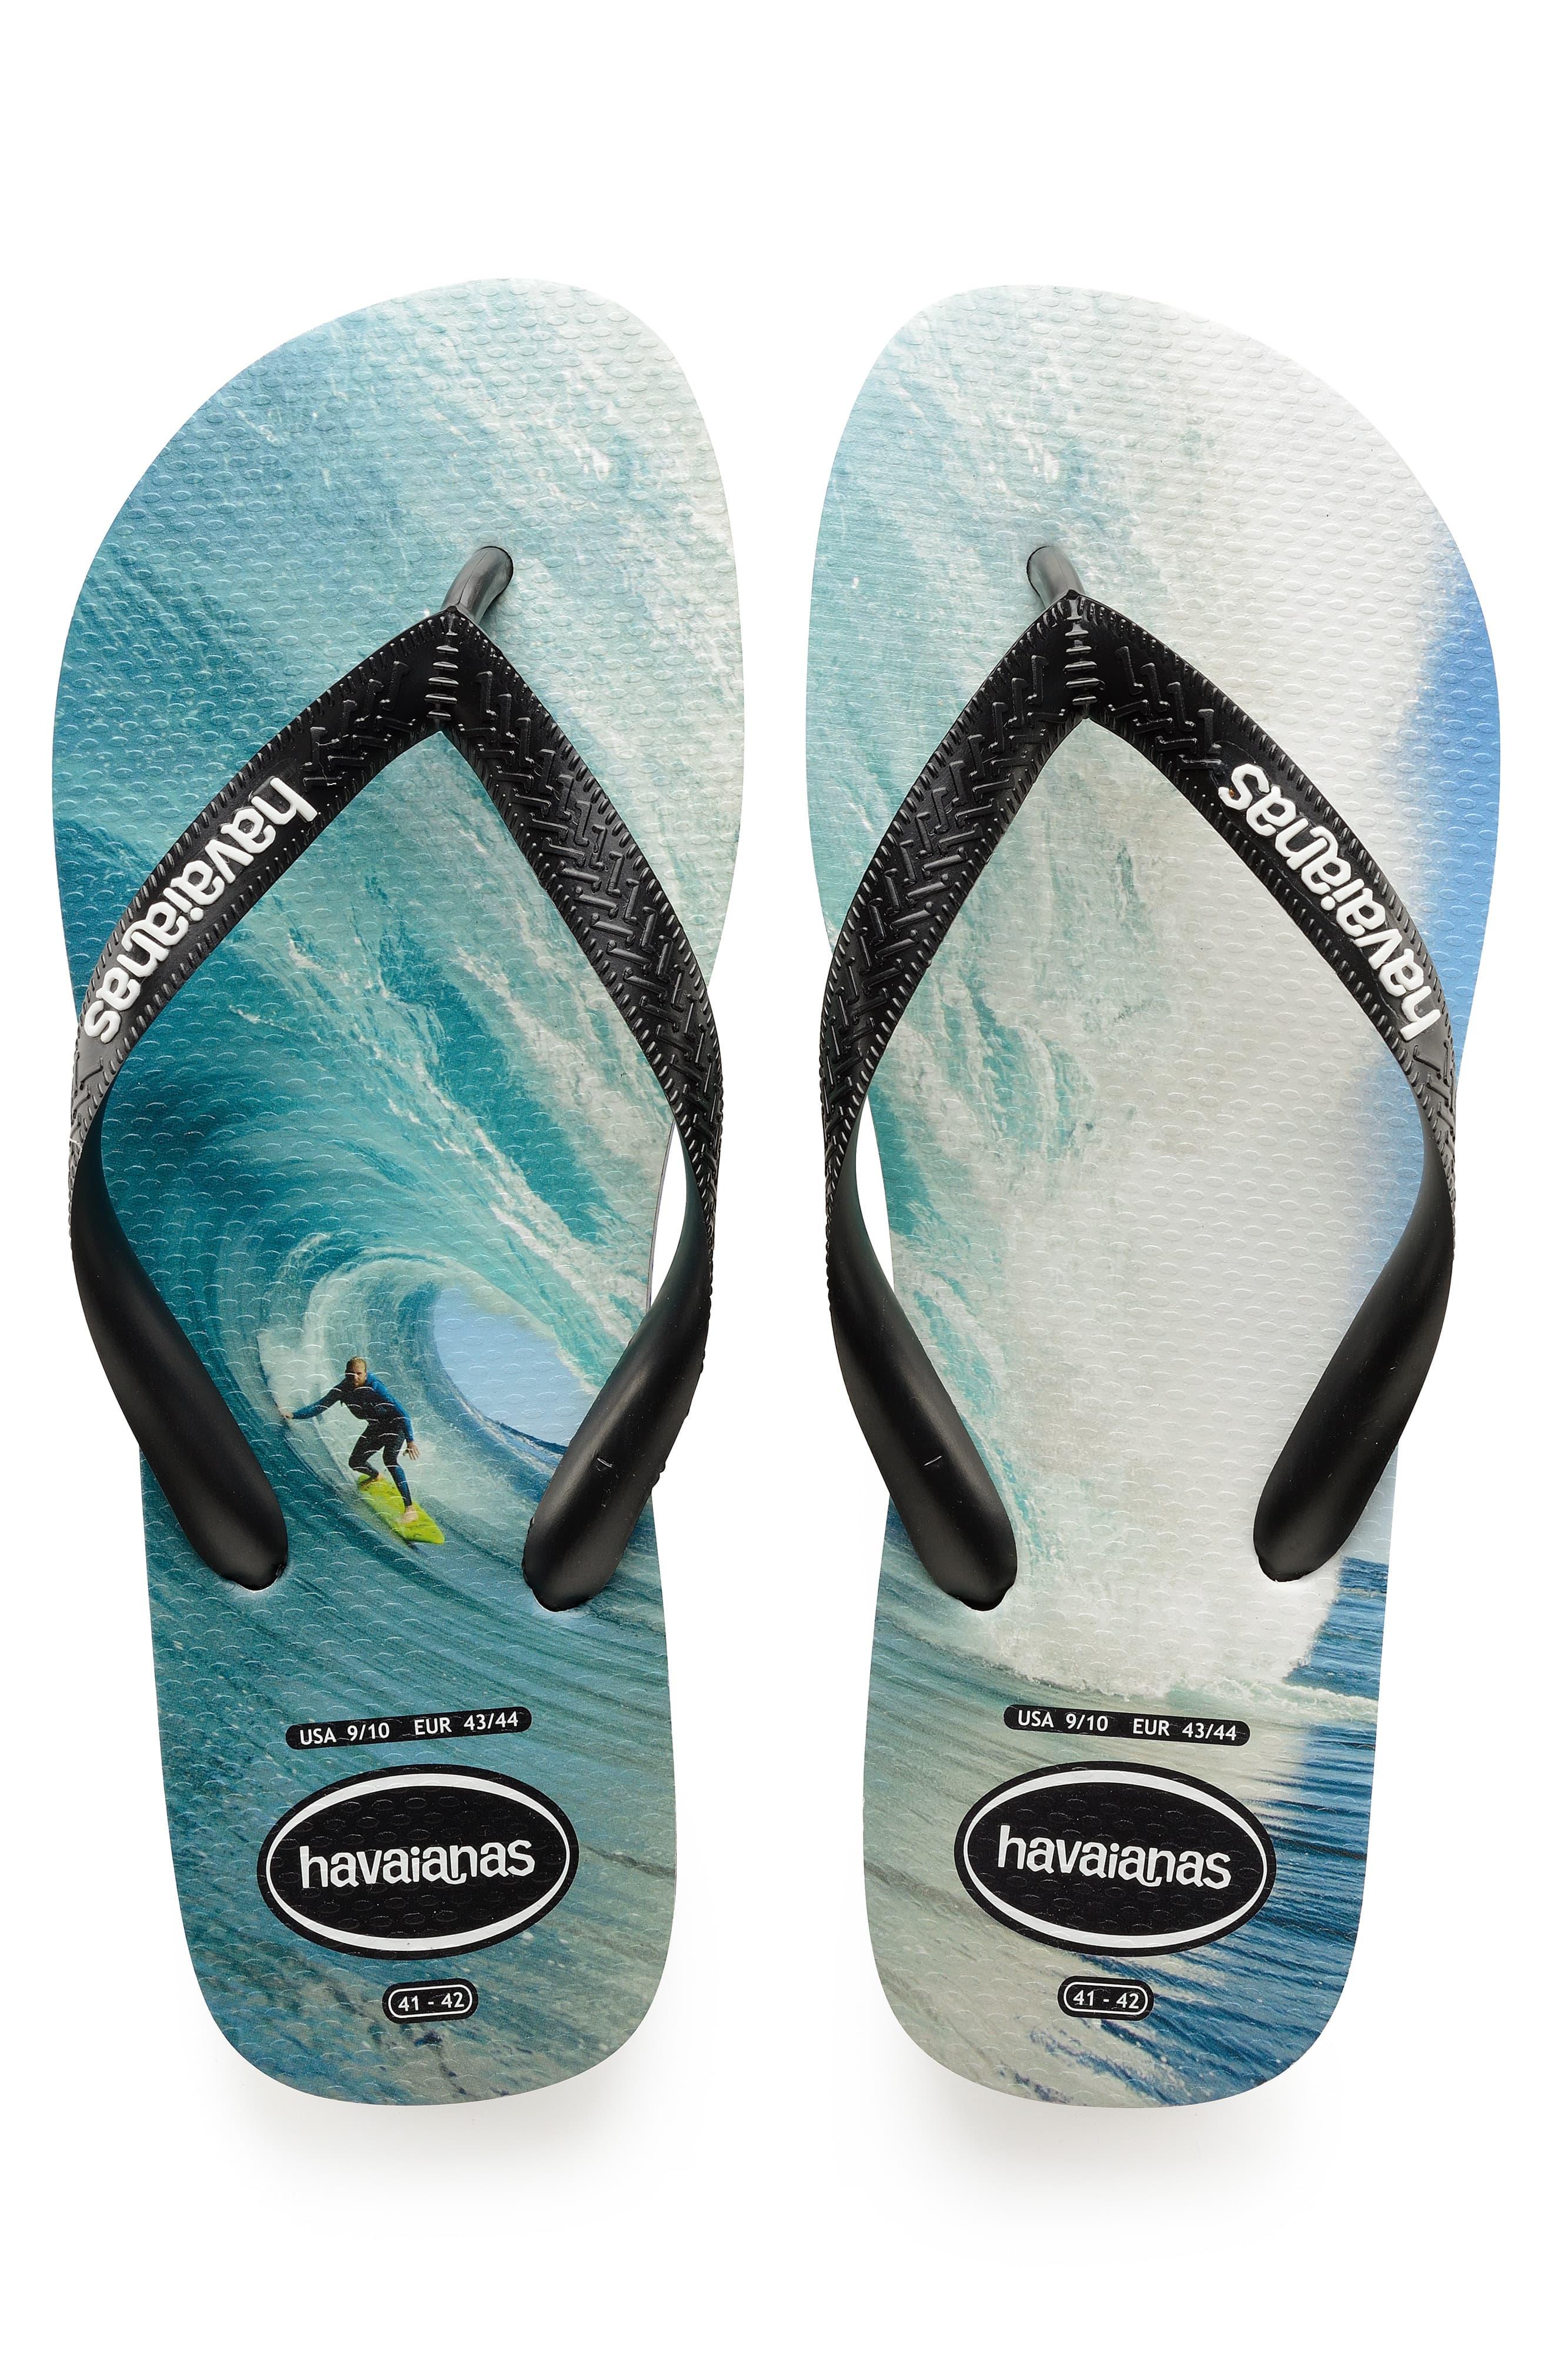 havaianas flip flops black and blue